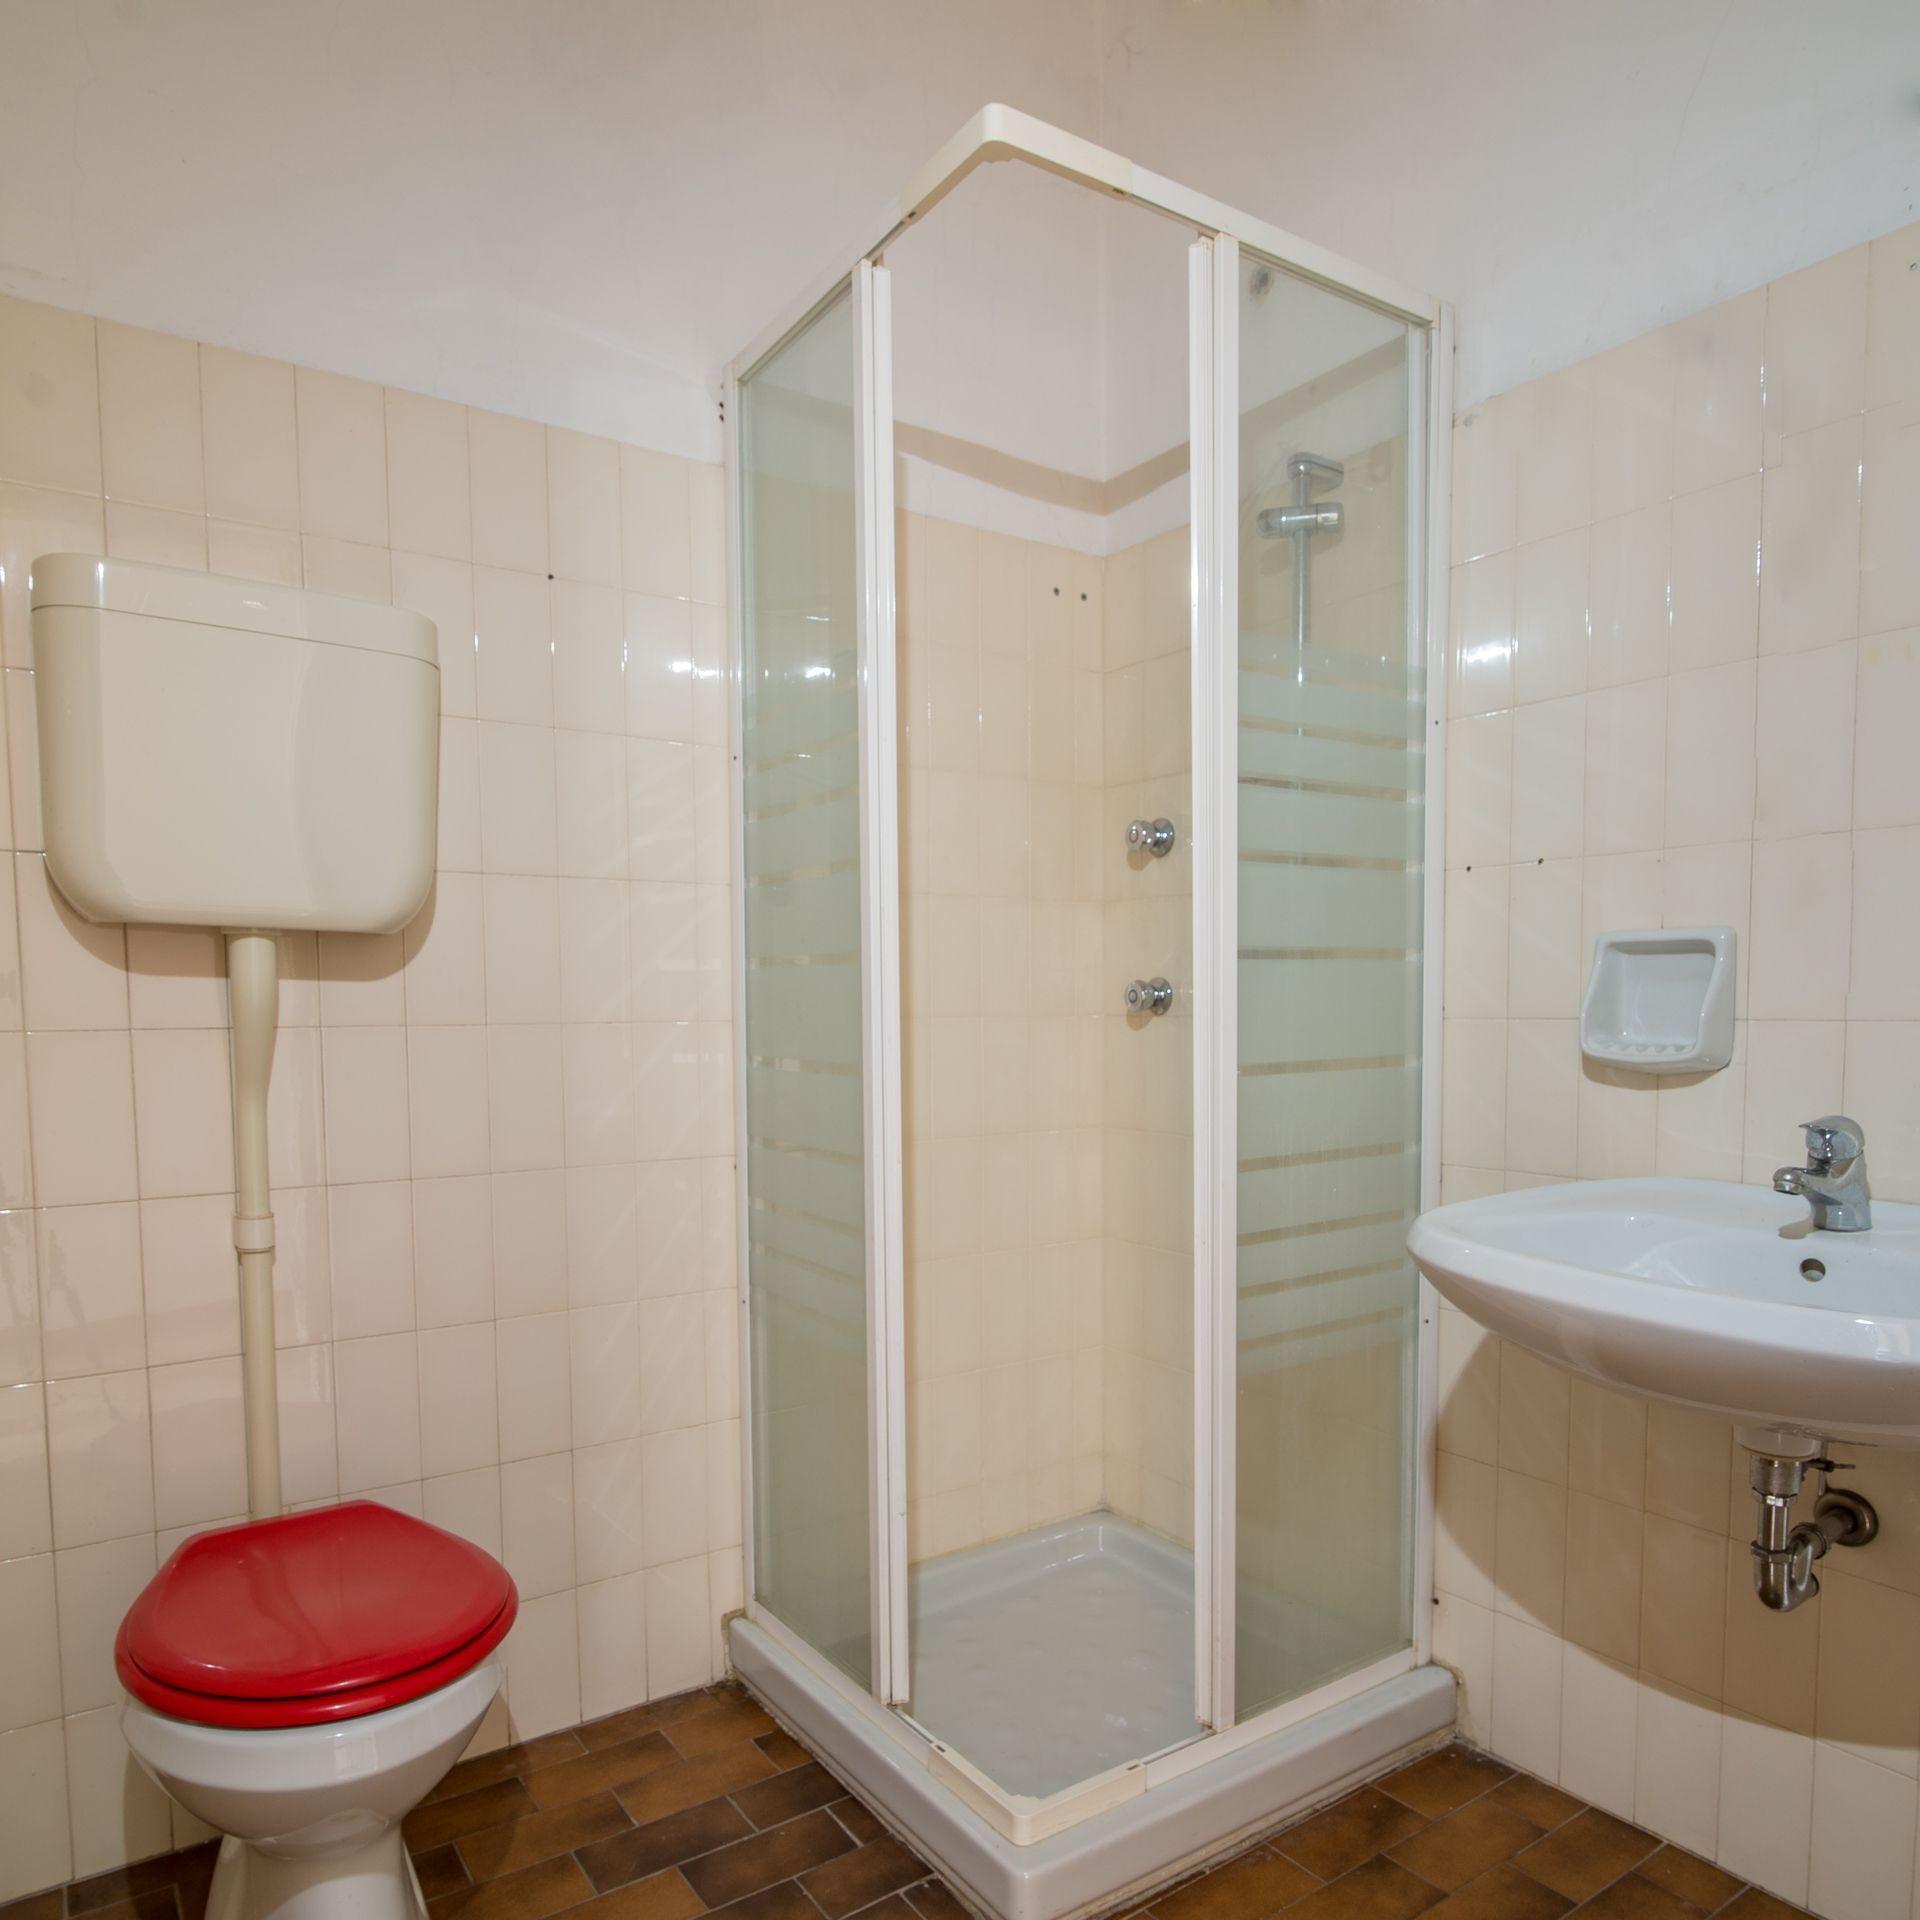 Appartamento uso abitativo vendita a Padova